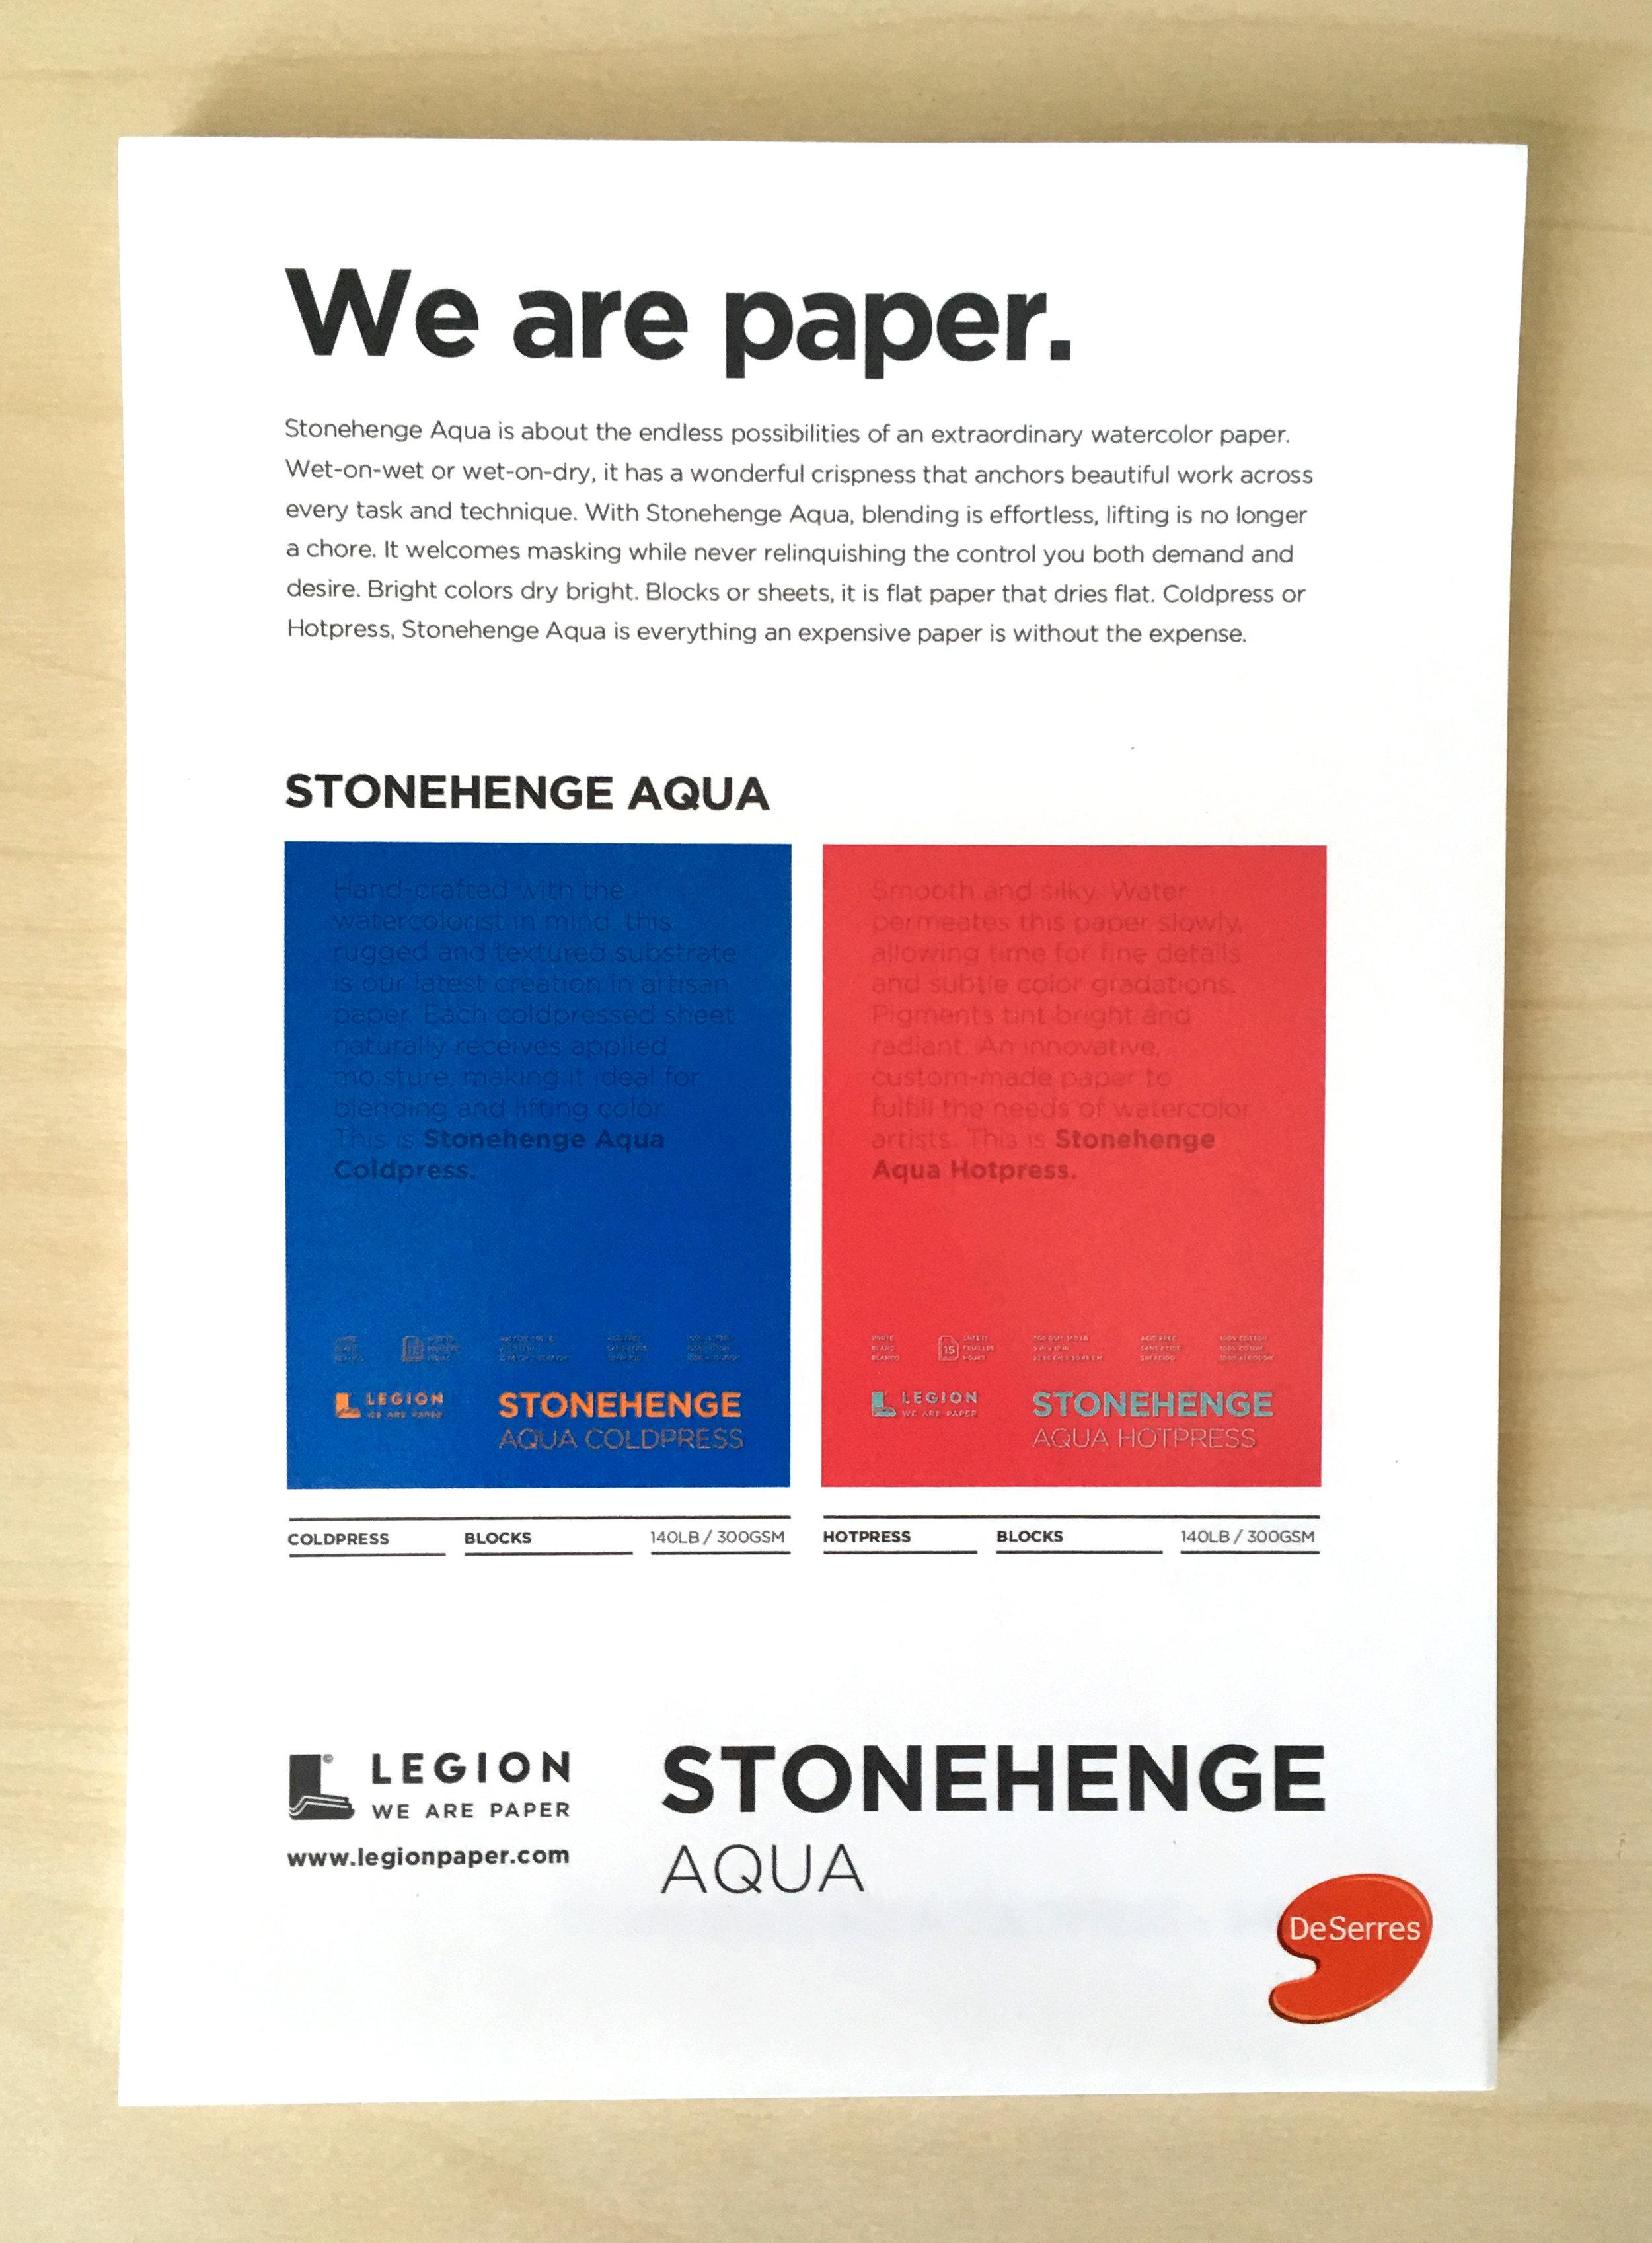 Legion_StonehengeAqua.jpg